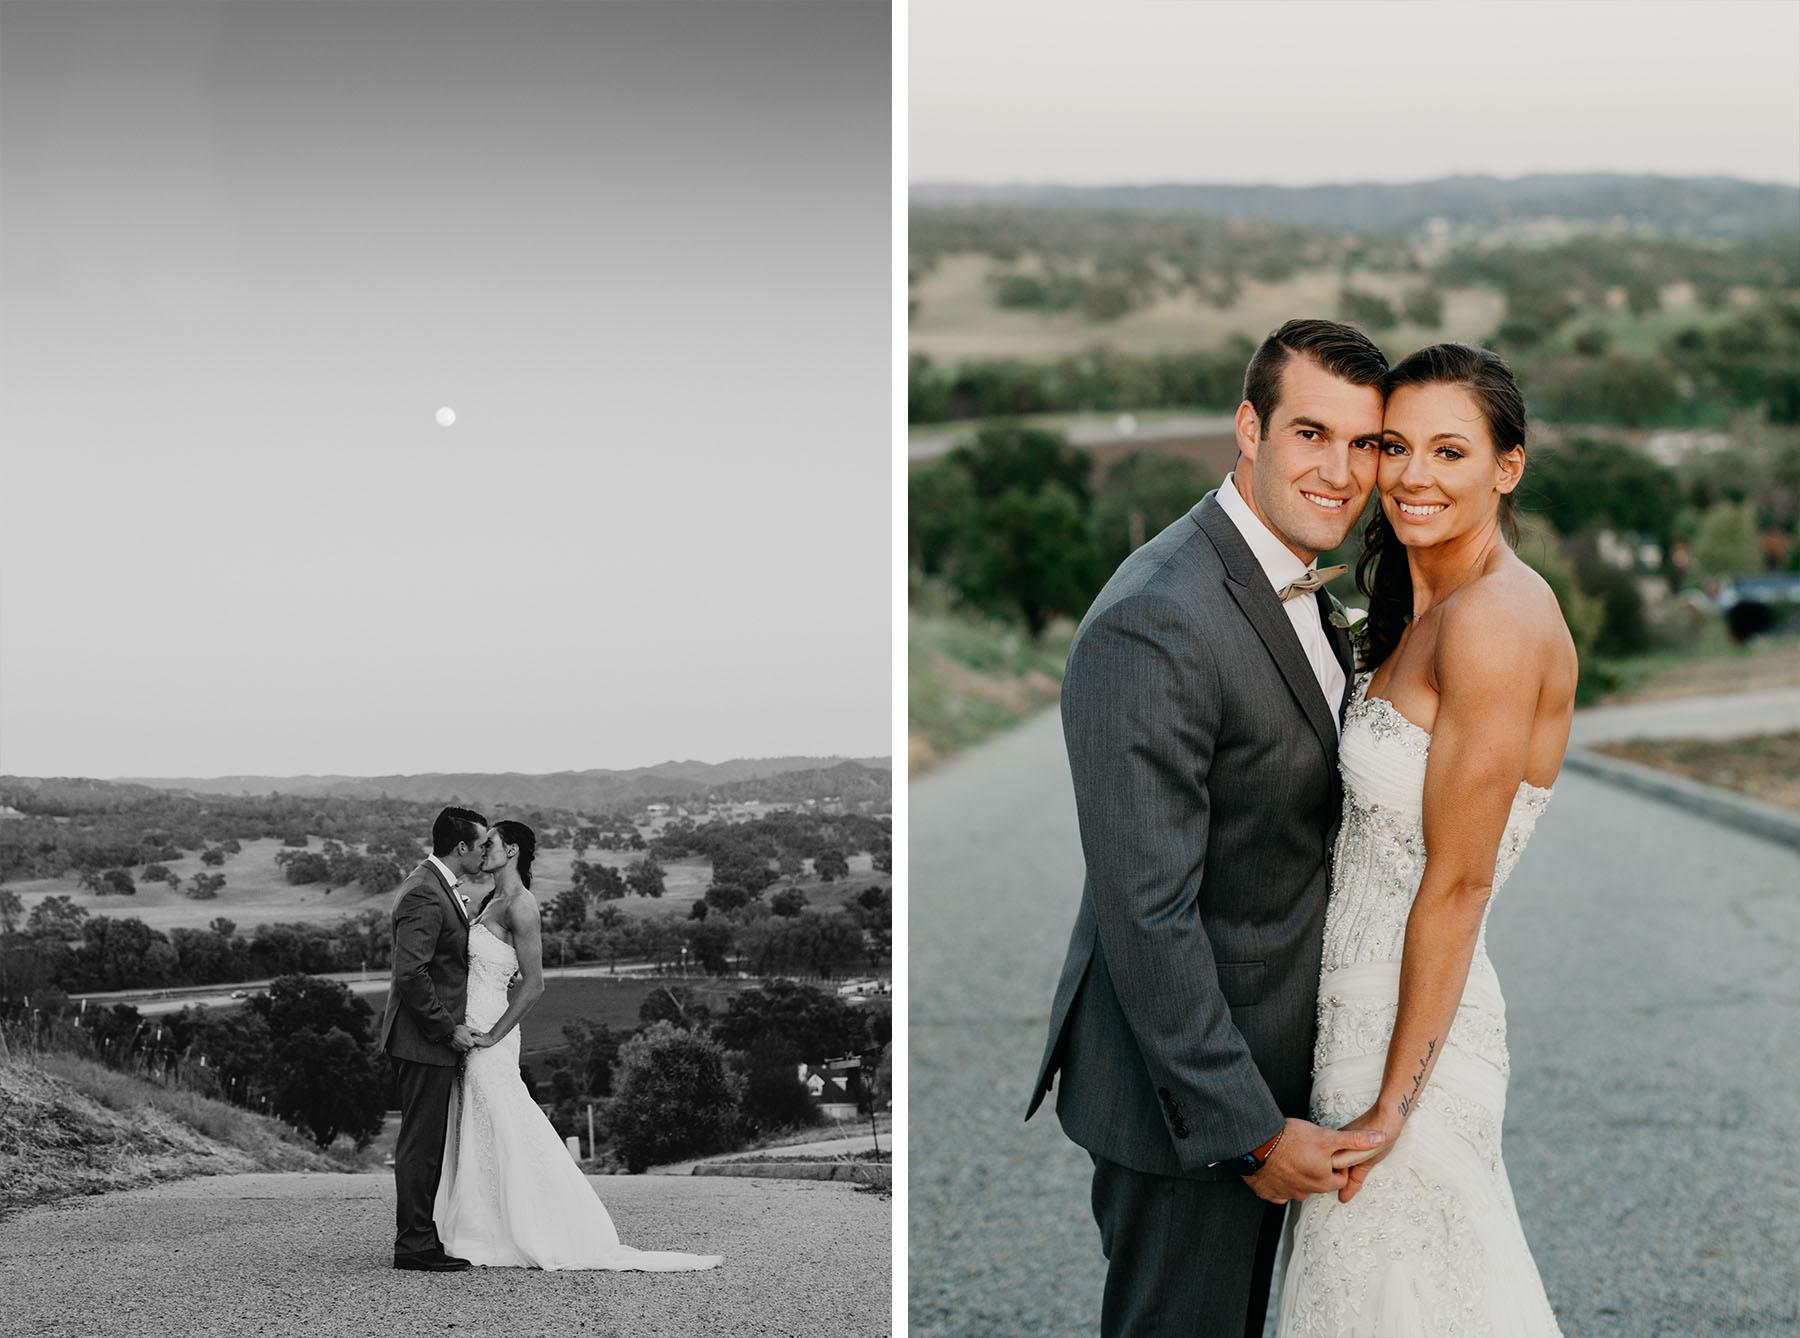 C+J-Grace-Maralyn-Estate-wedding-4.jpg